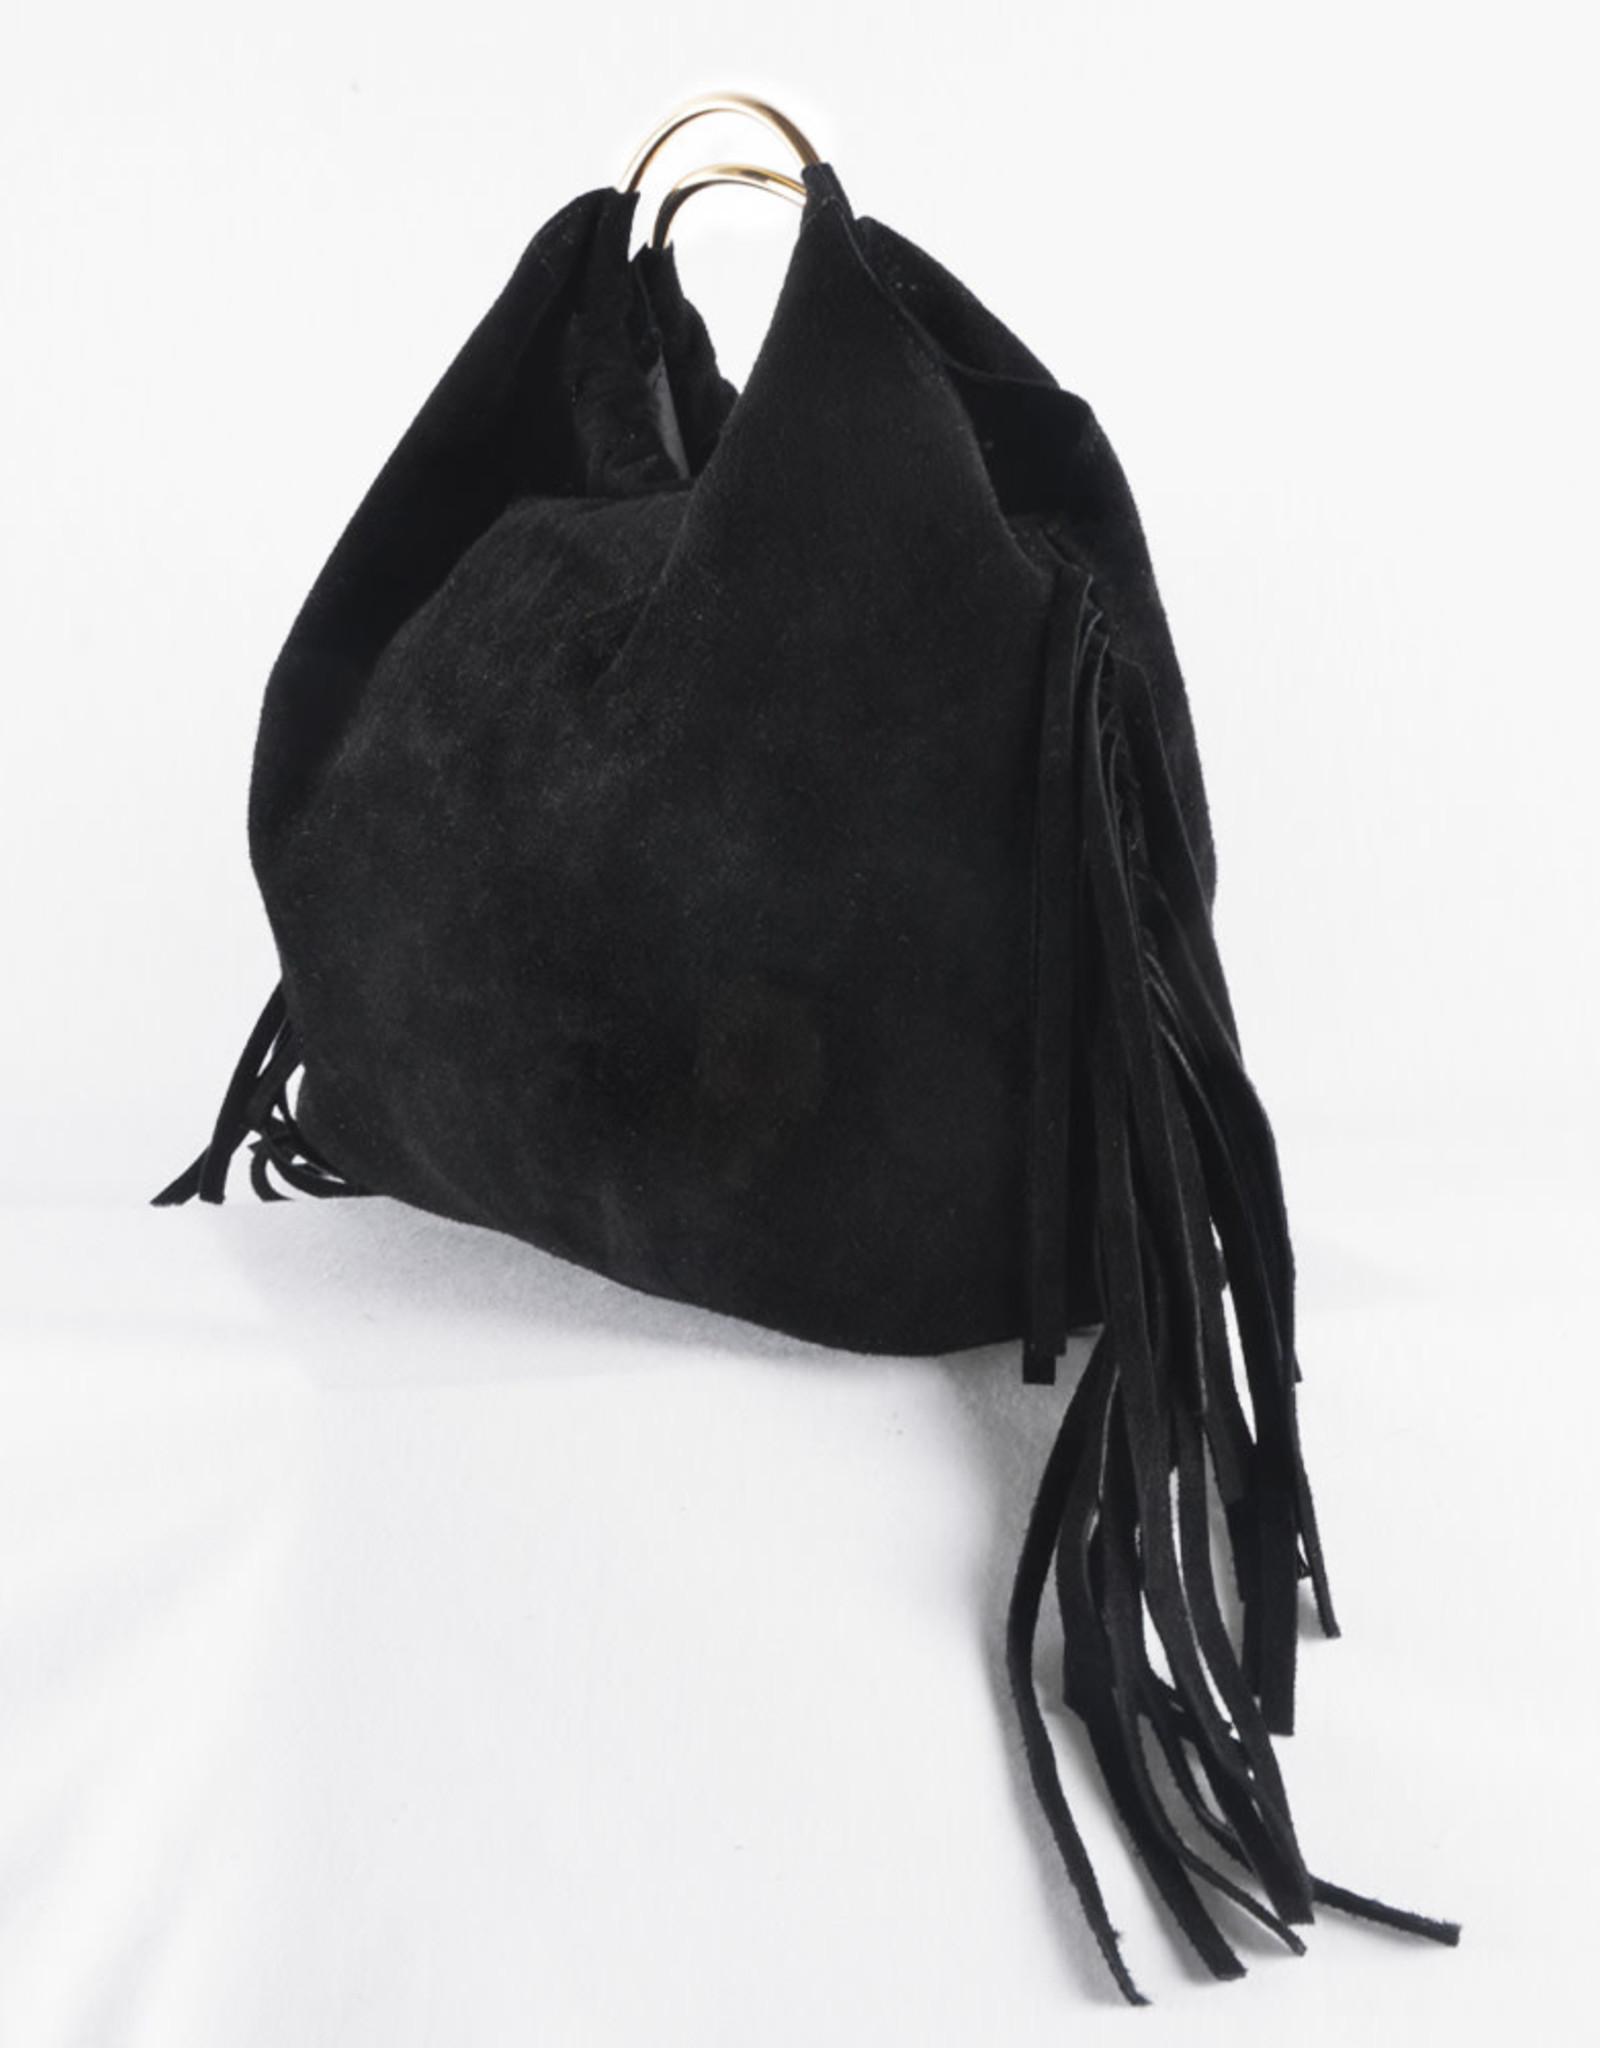 Boho golden handle bag